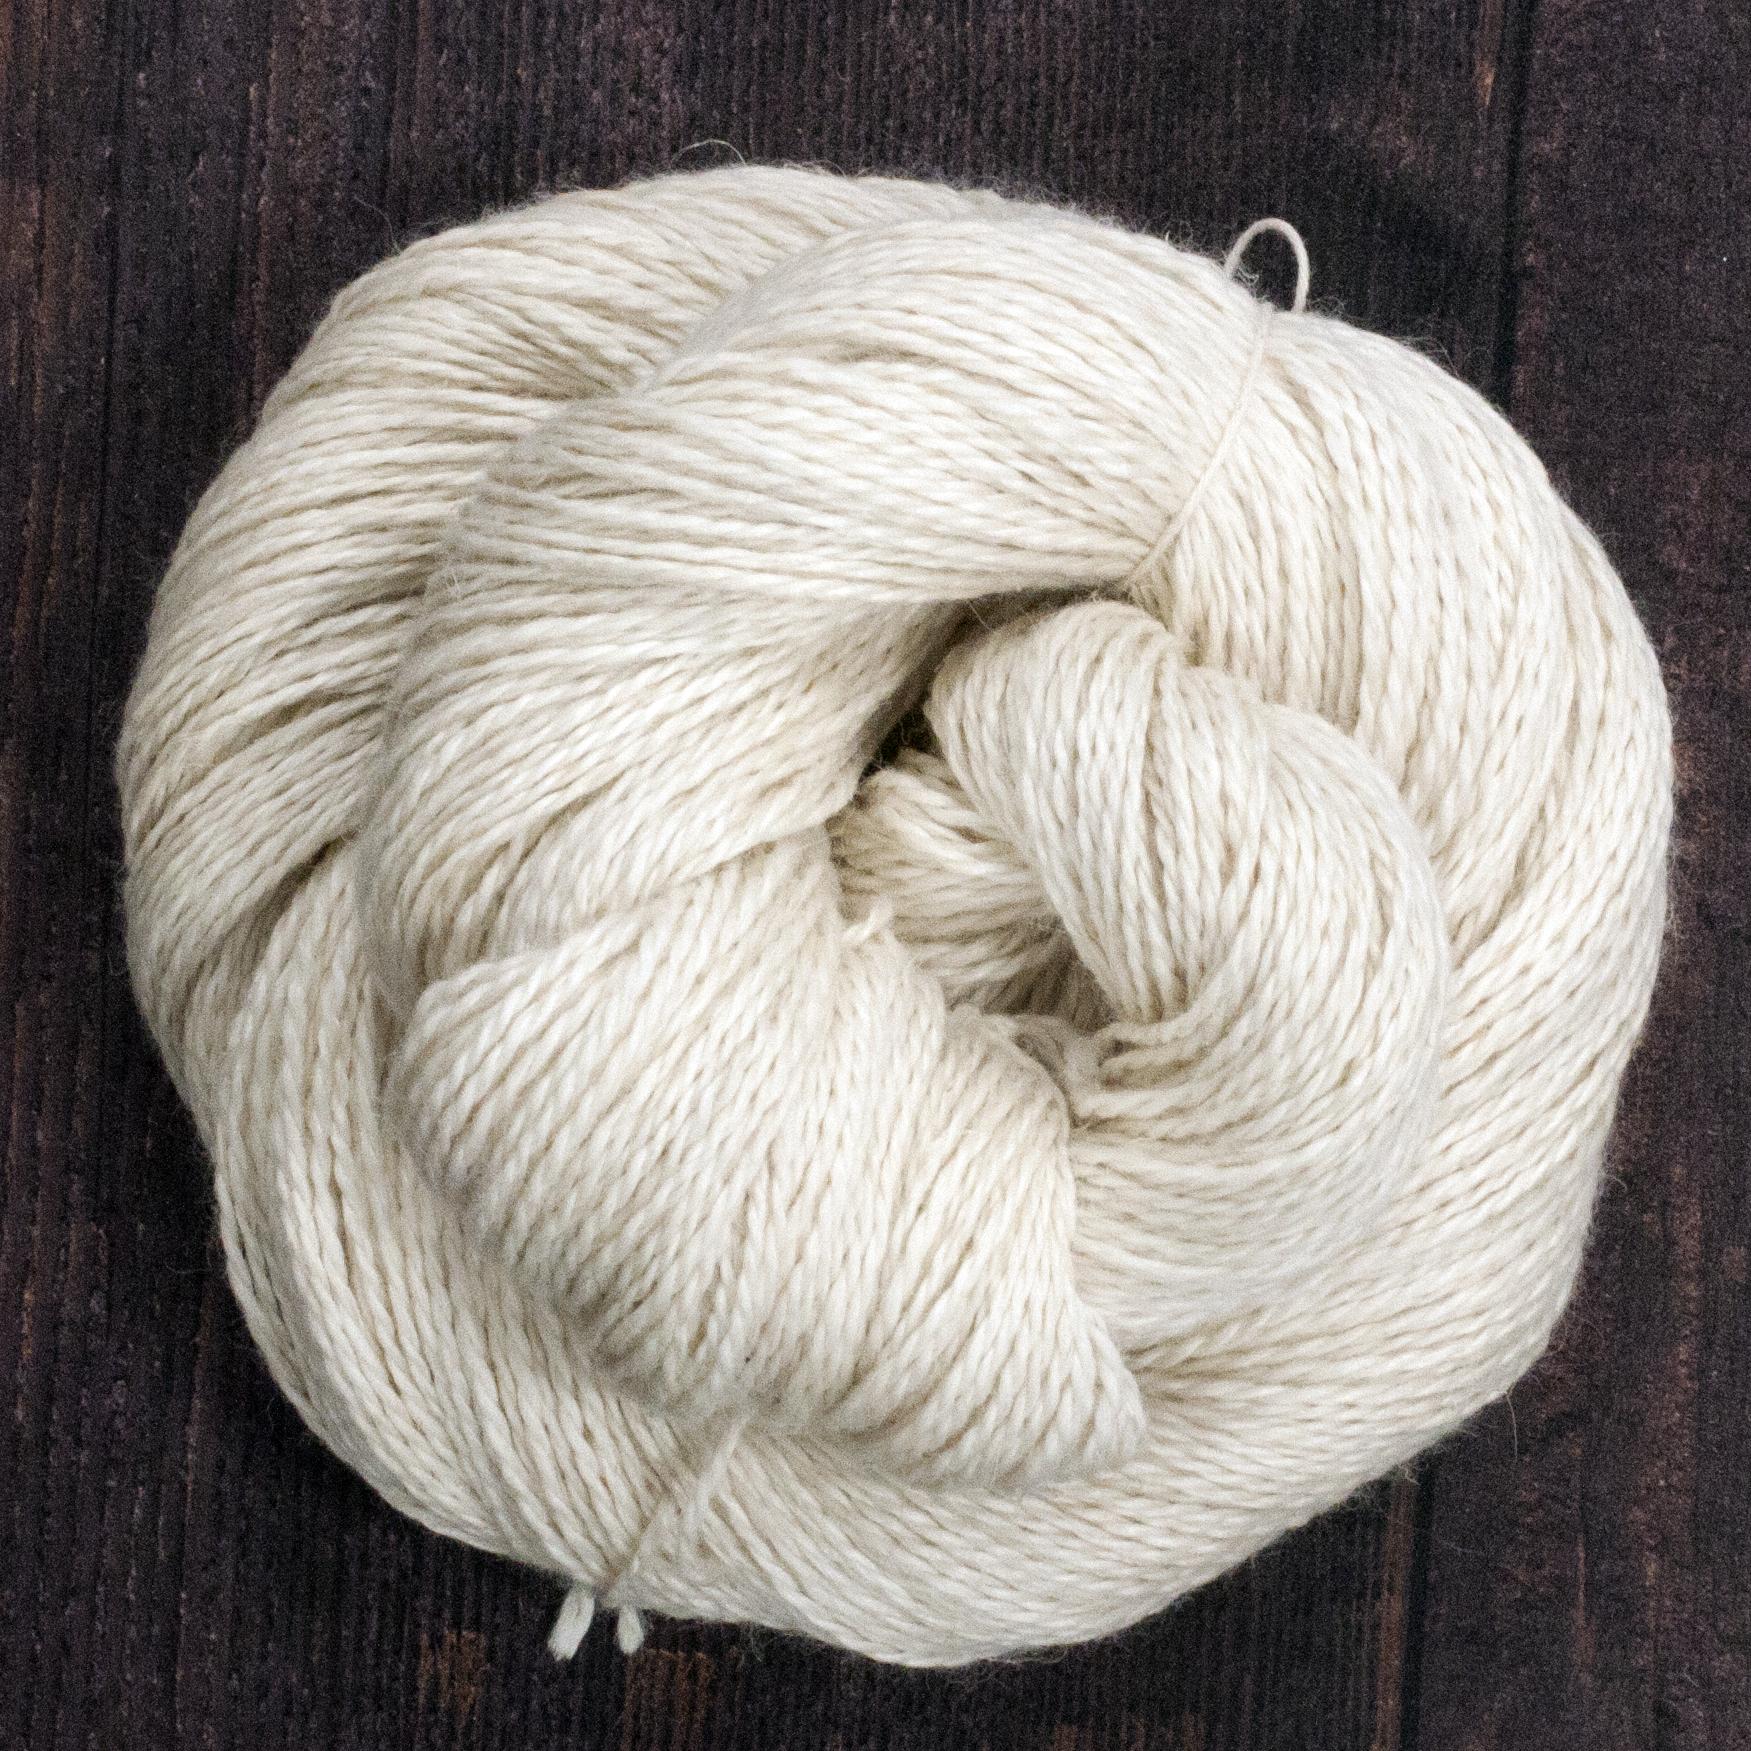 Type 49221   Egyptian DK 50% Baby Alpaca  25% Linen  25% Silk  100g Hanks  250m per 100g 2/5nm